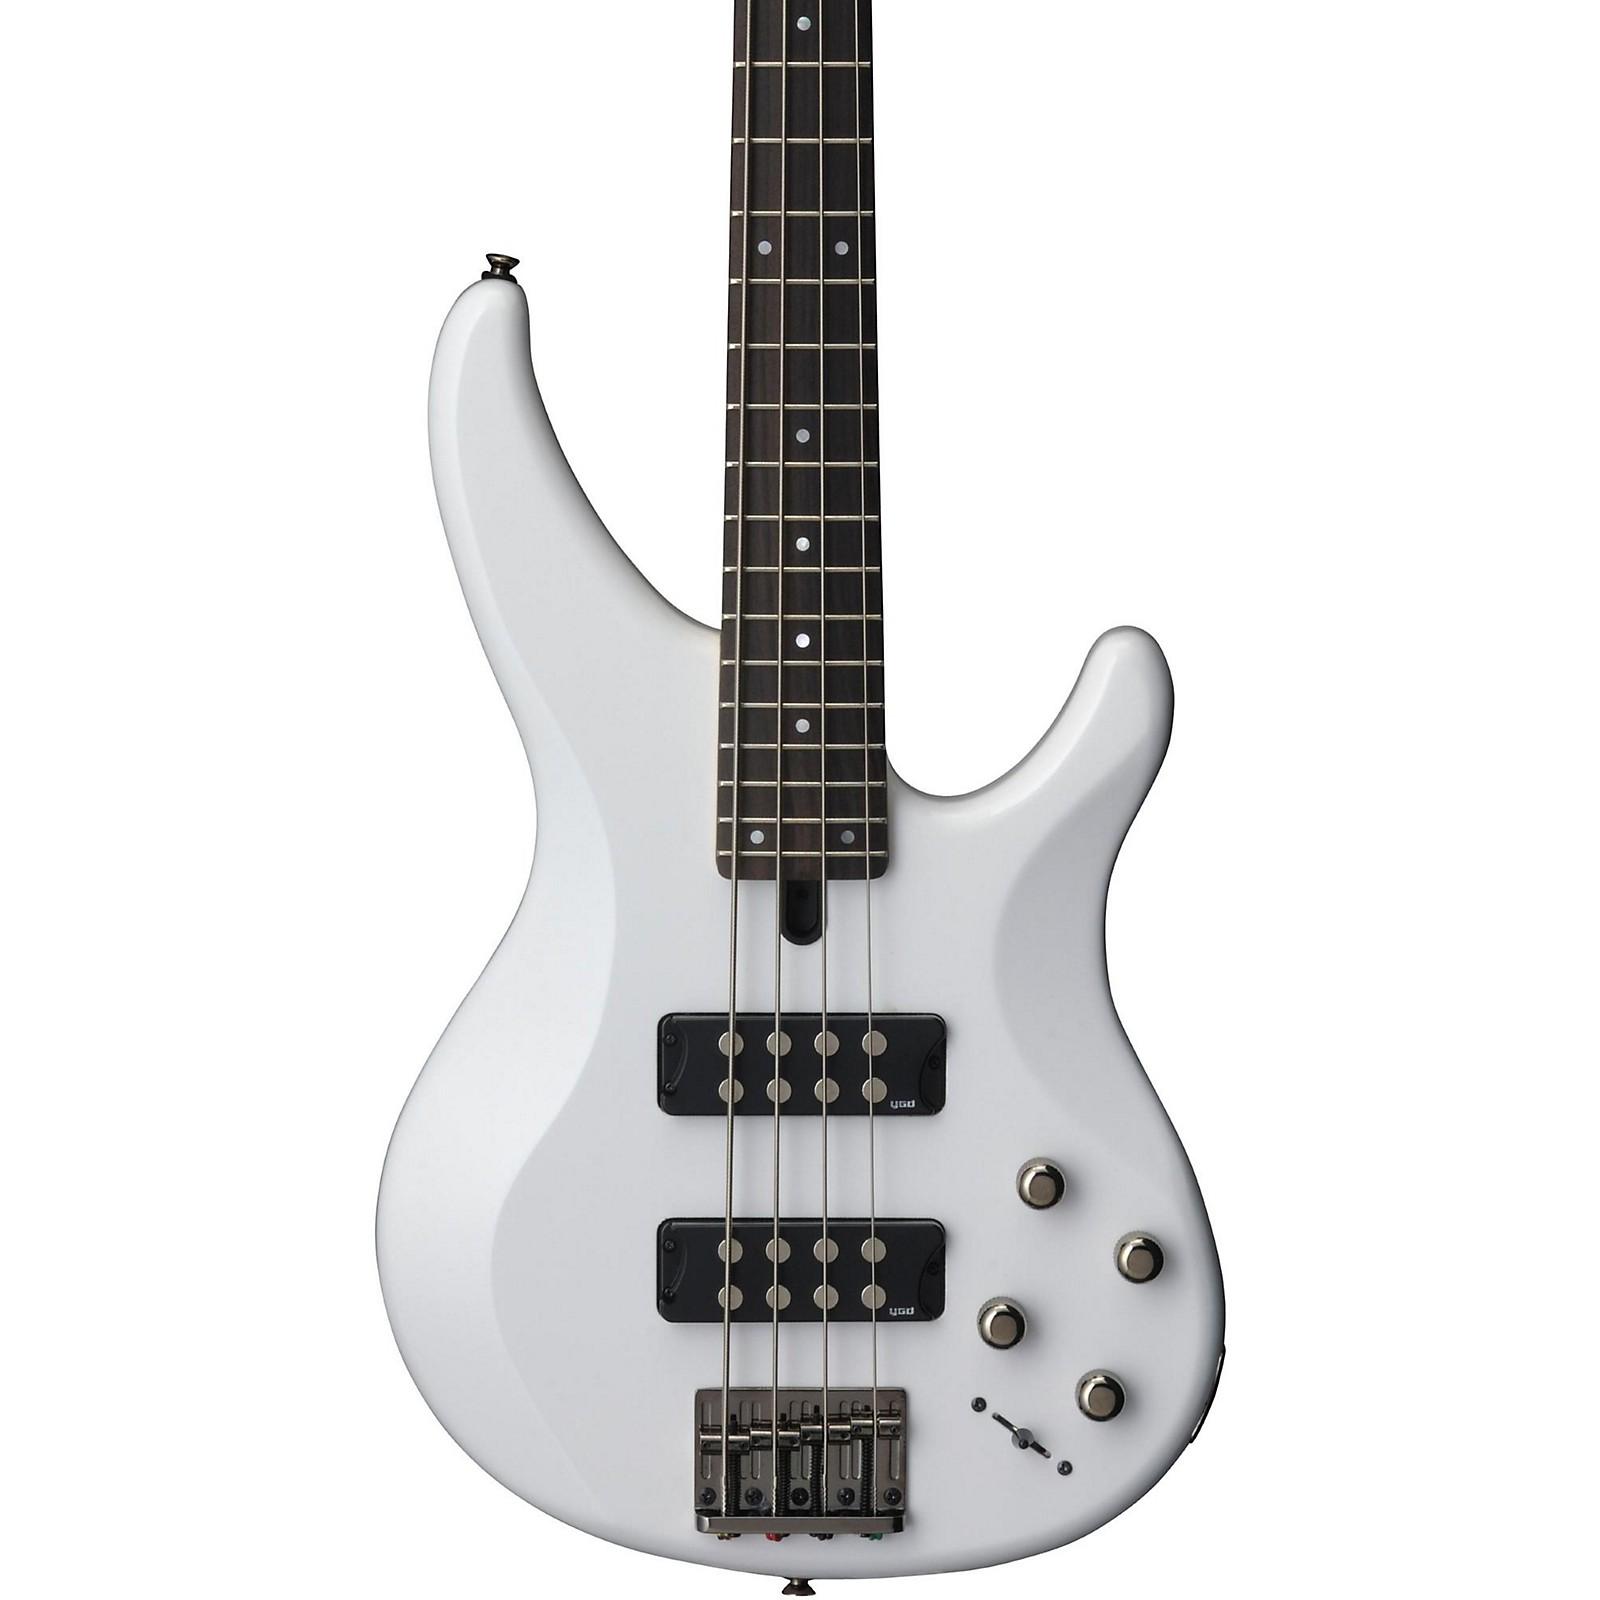 Yamaha TRBX304 4-String Electric Bass